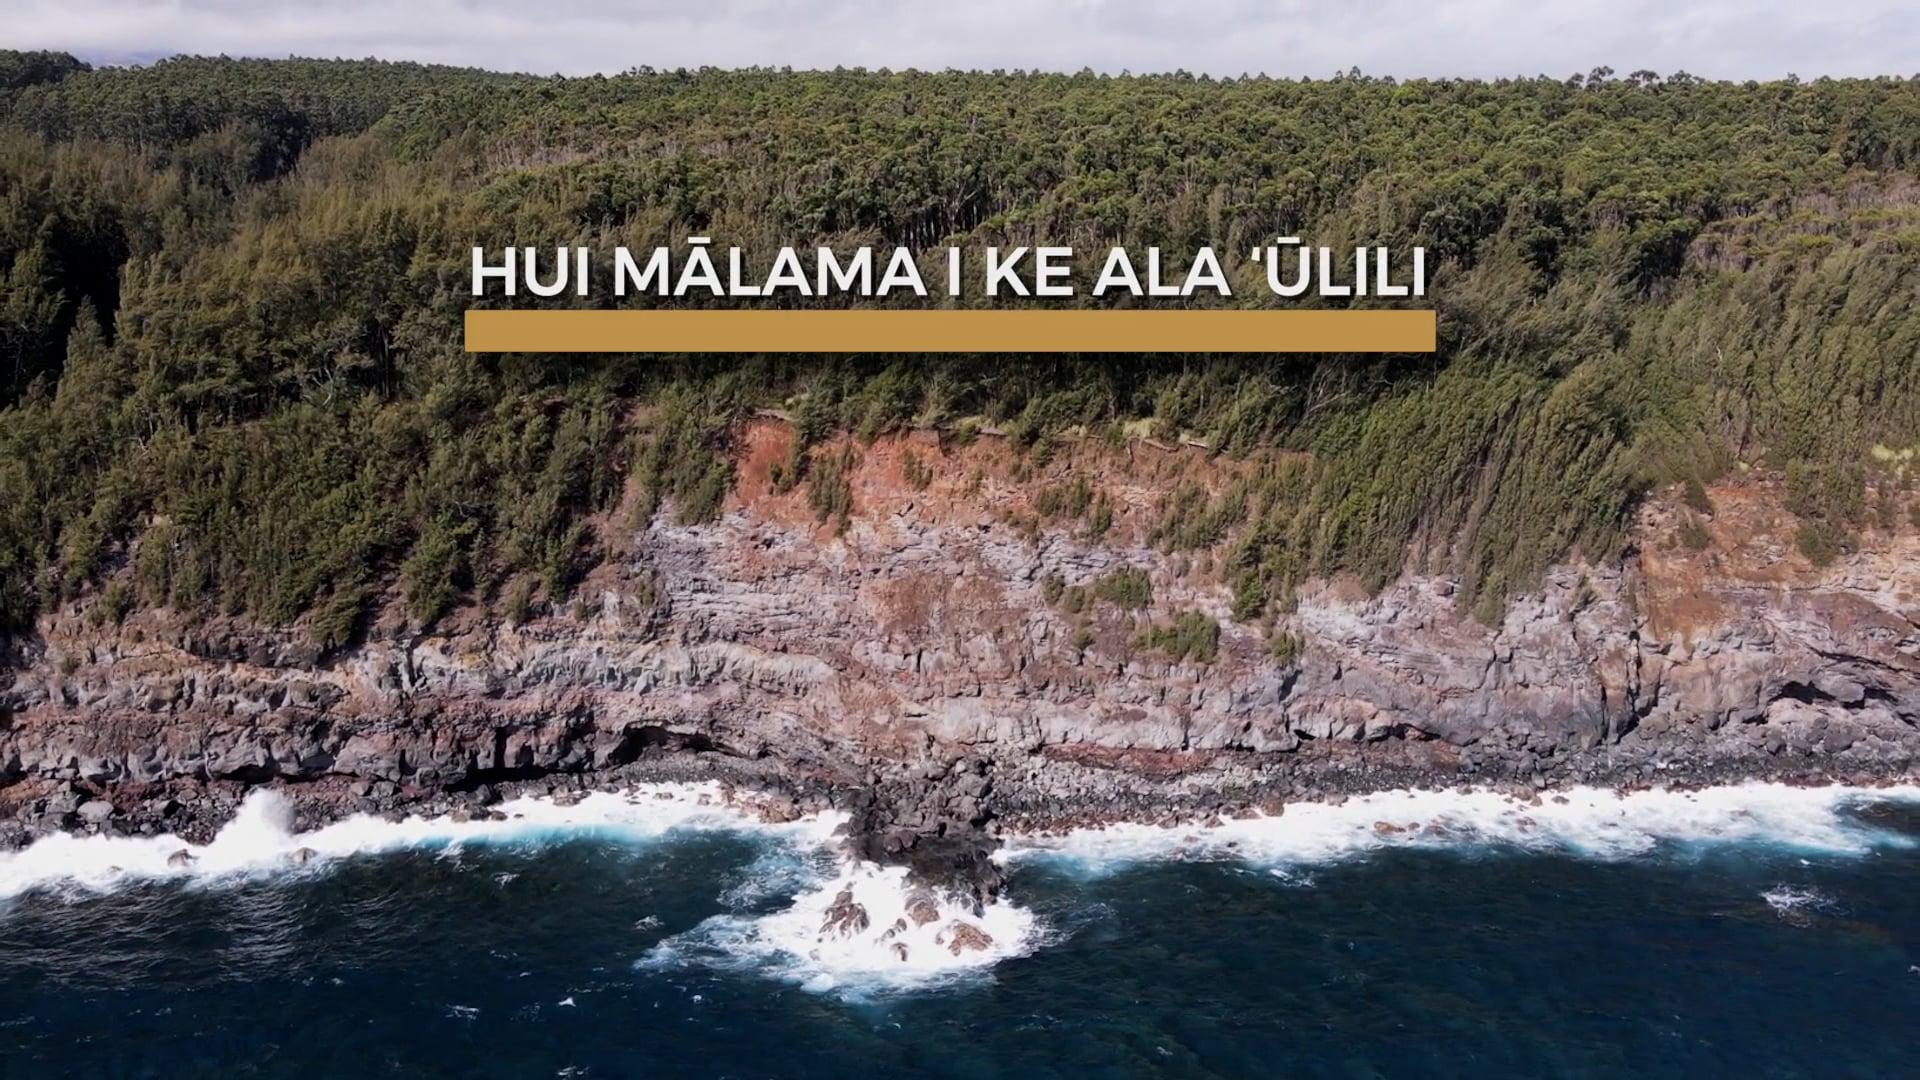 Community Restoration Partnership: Hui Mālama i ke  Ala ʻŪlili